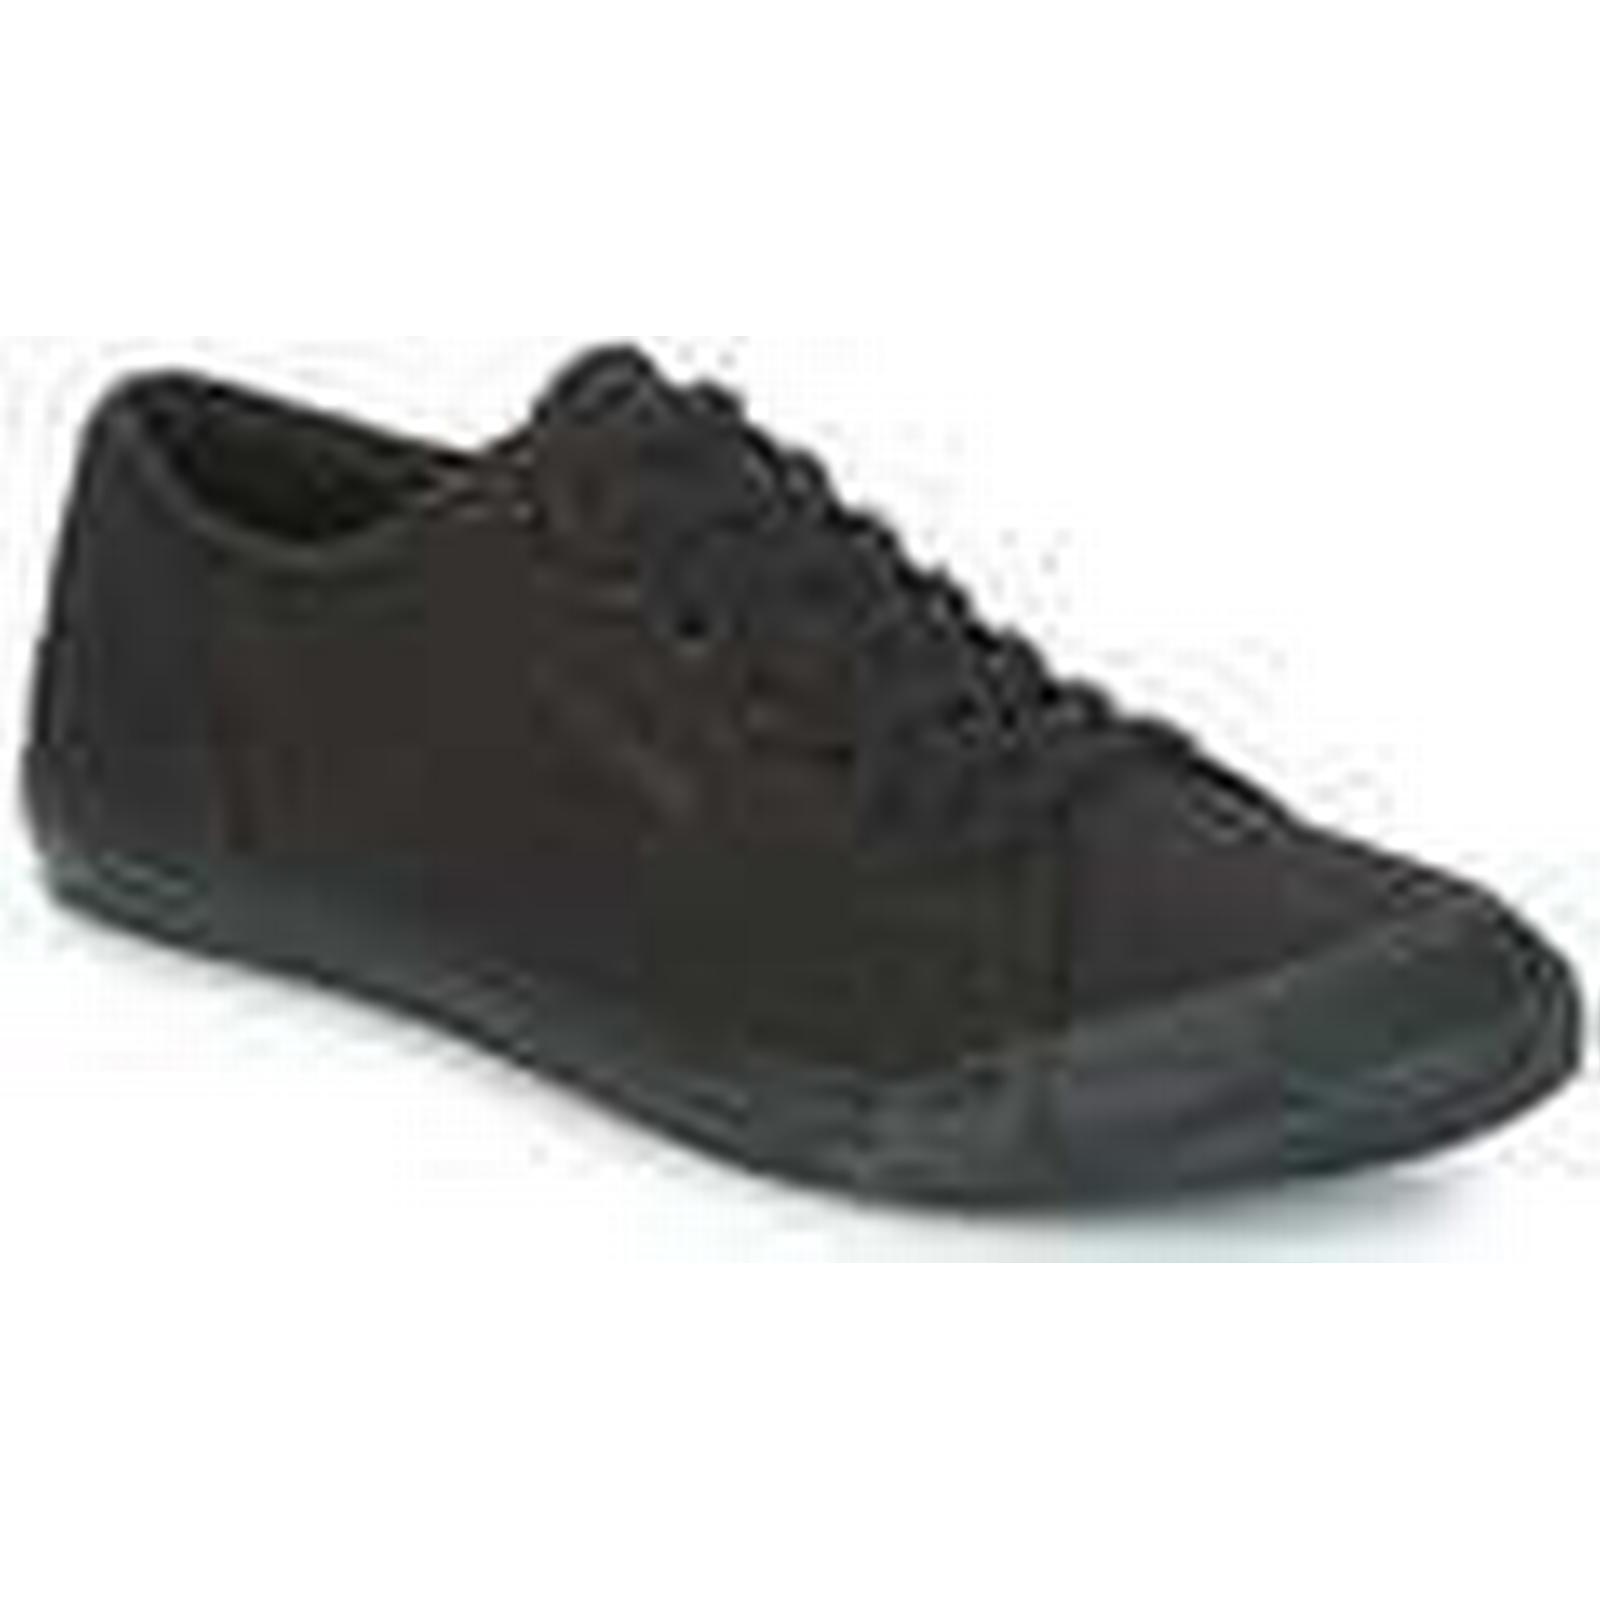 Le Coq Sportif Shoes  DEAUVILLE-SPORT  women's Shoes Sportif (Trainers) in Black e1eddf